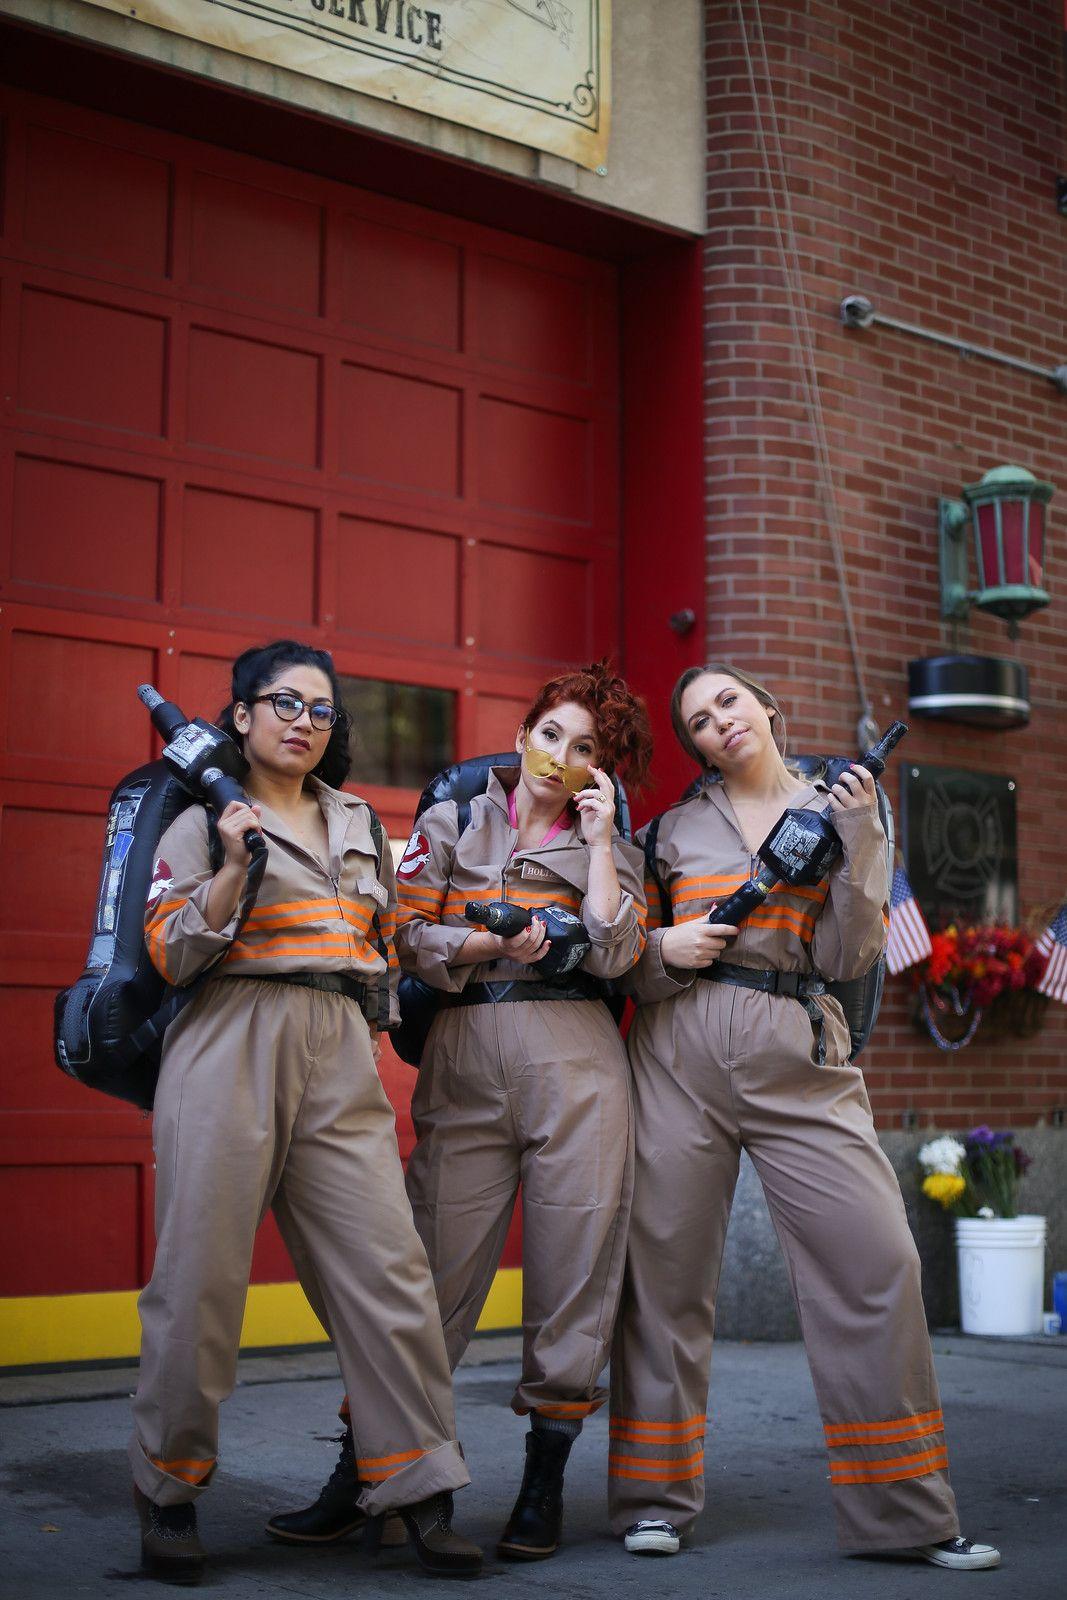 15 Best Trio Halloween Costume Ideas 2020 Family Of 3 Halloween Costume Ideas